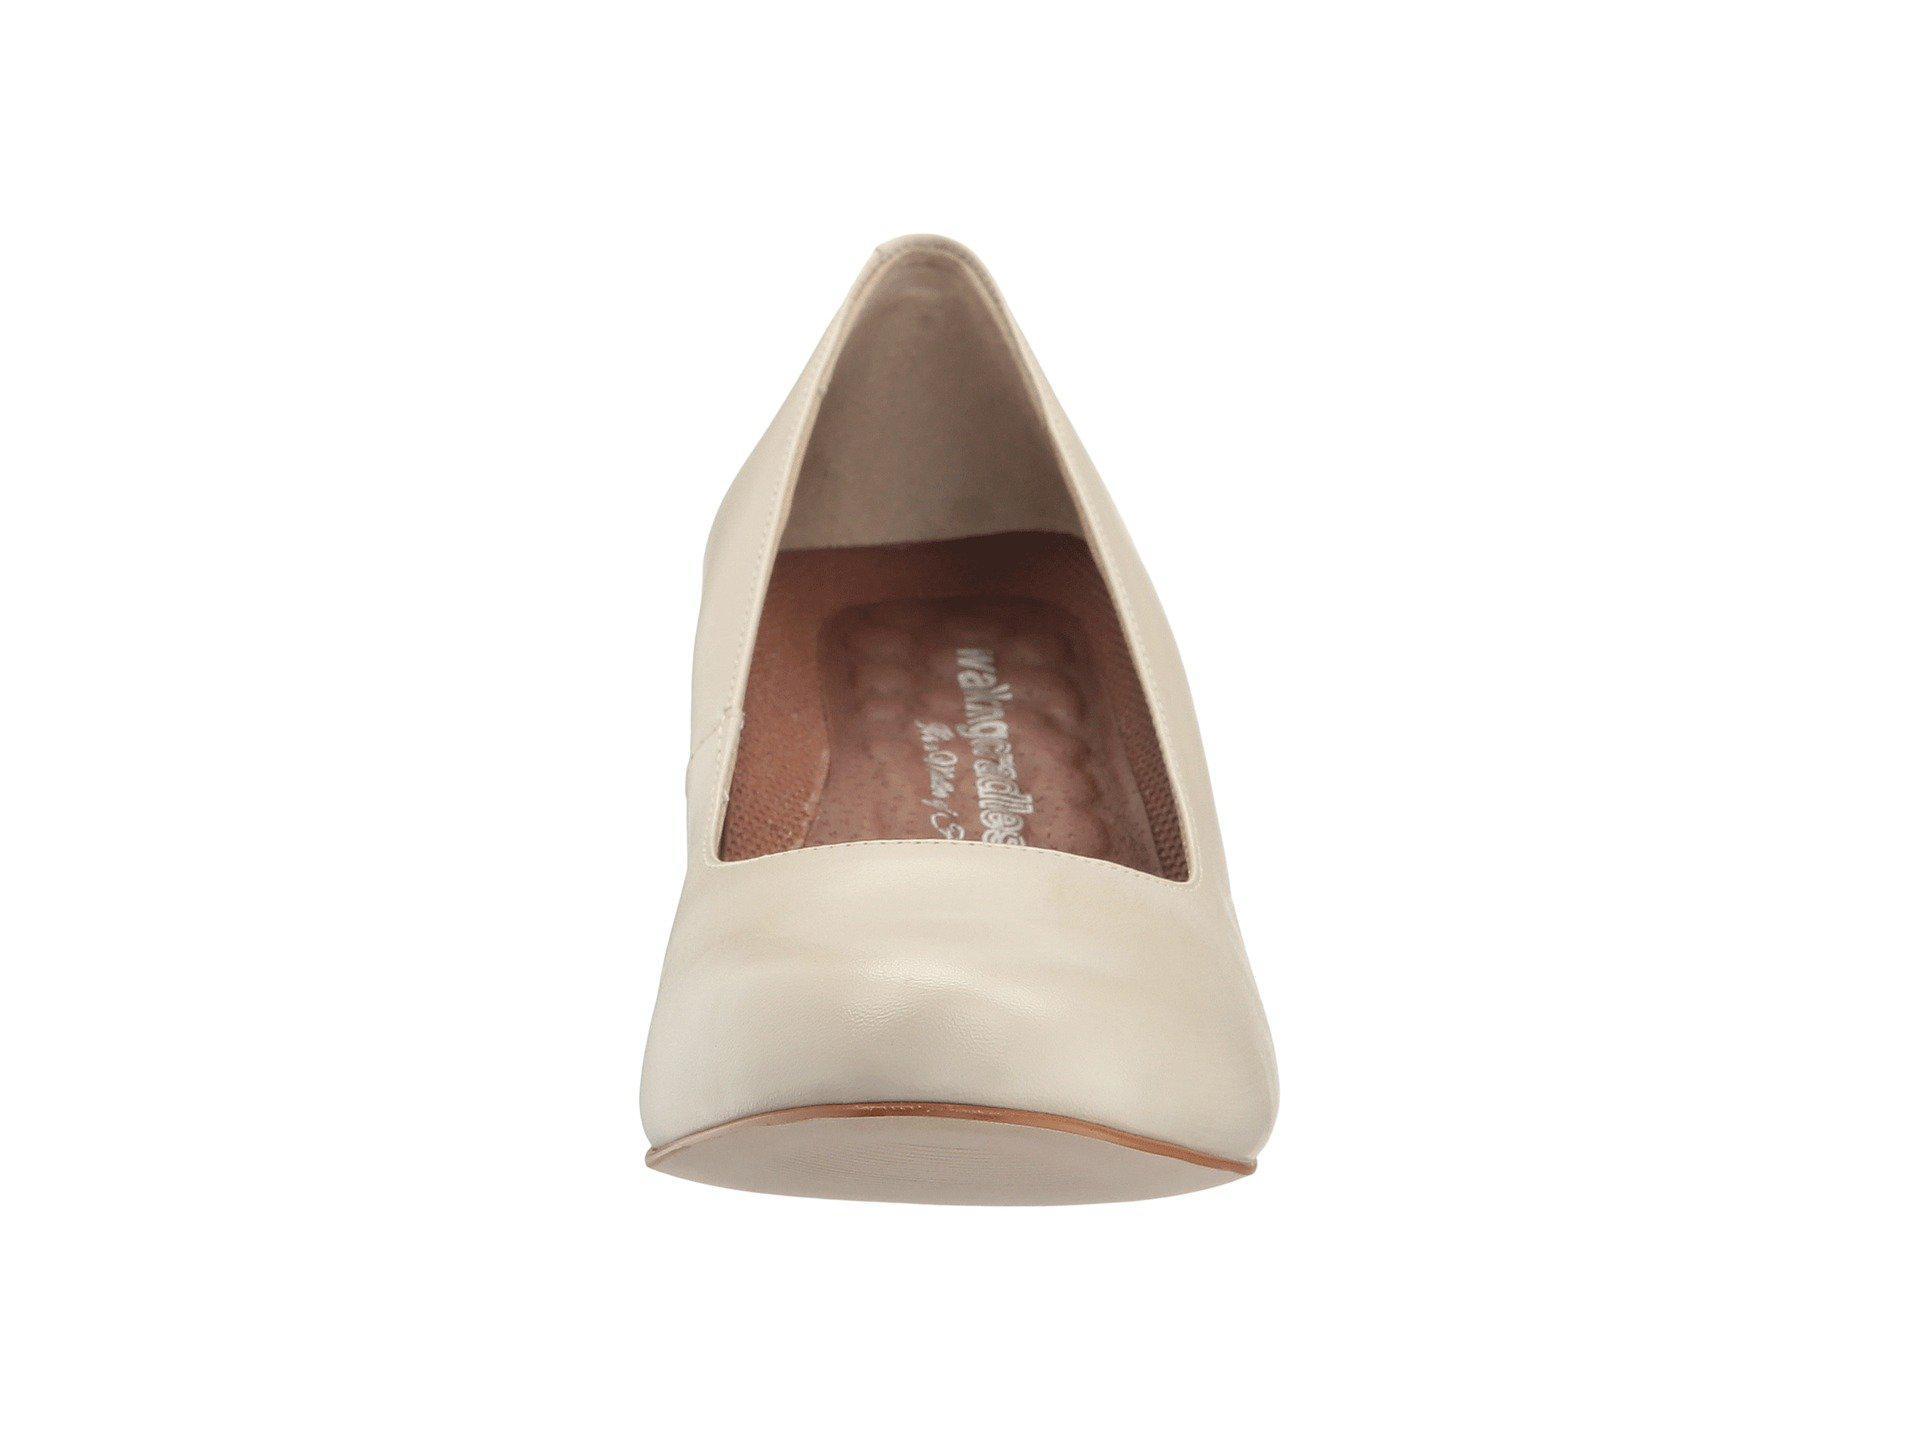 788159dca3 Lyst - Walking Cradles Joy (nude Patent) Women's Shoes - Save 20%